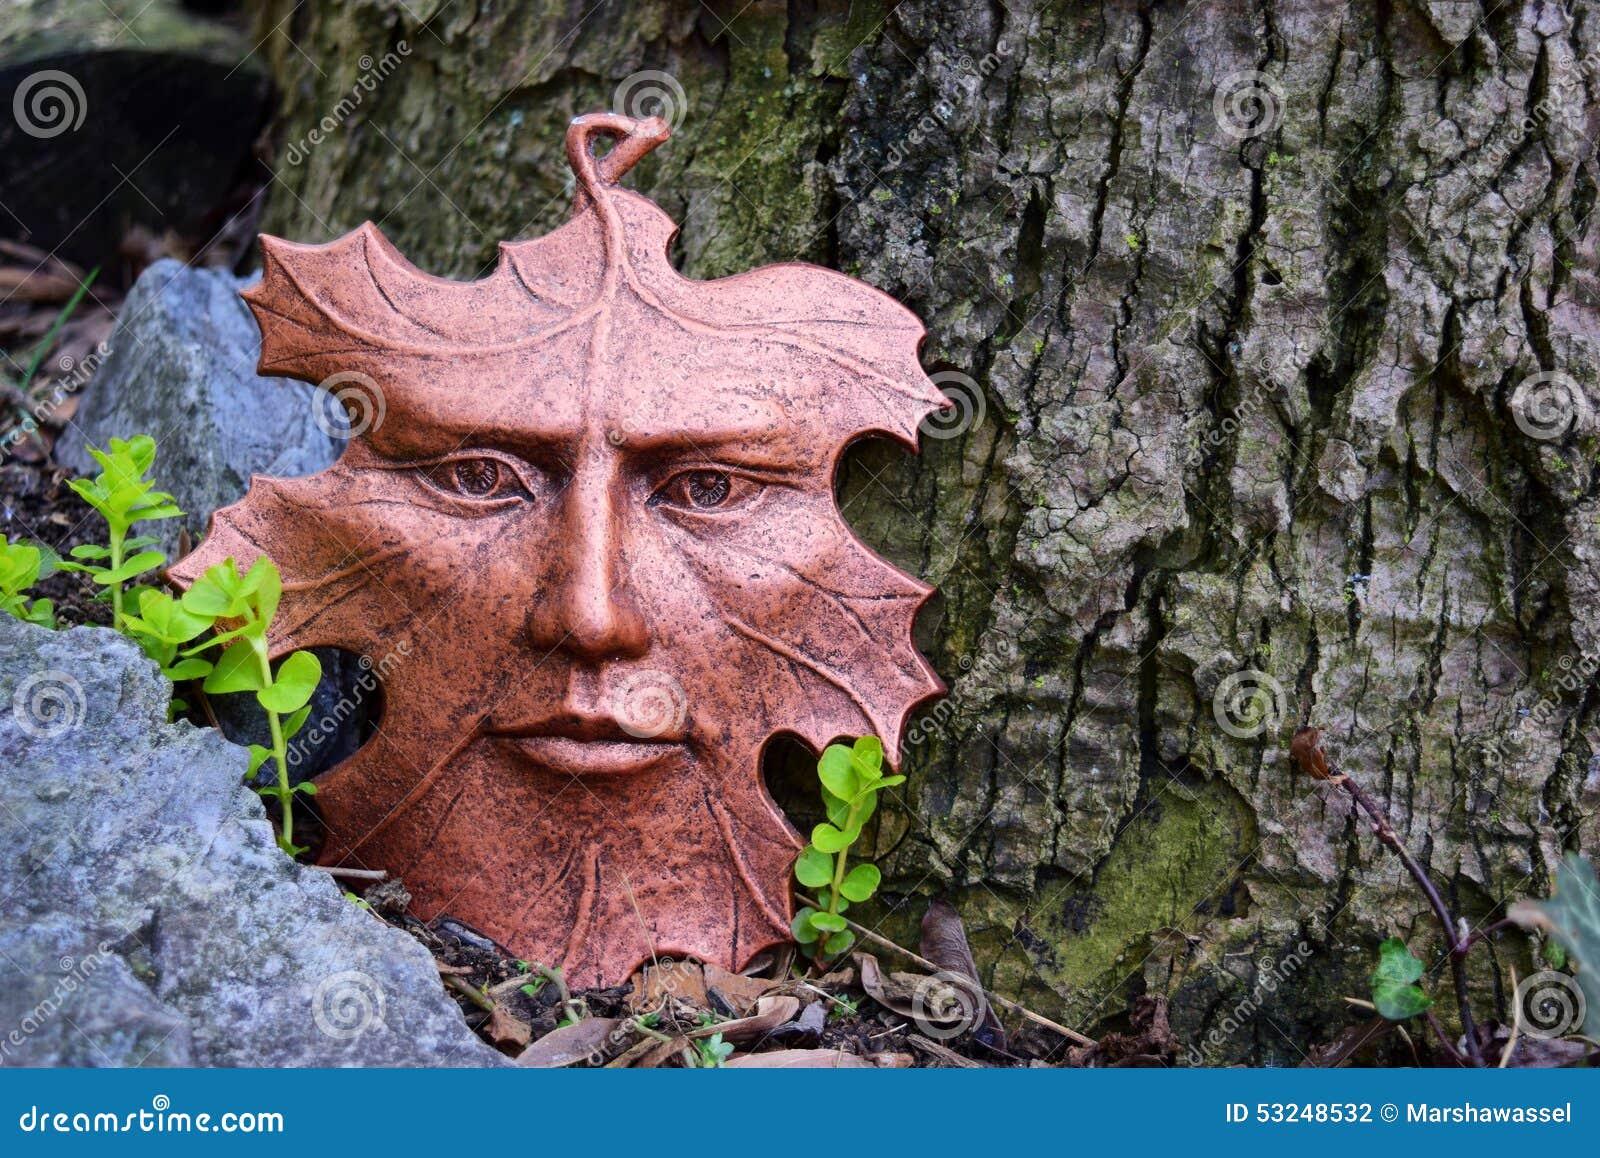 Leaf Face Sculpture In The Garden.